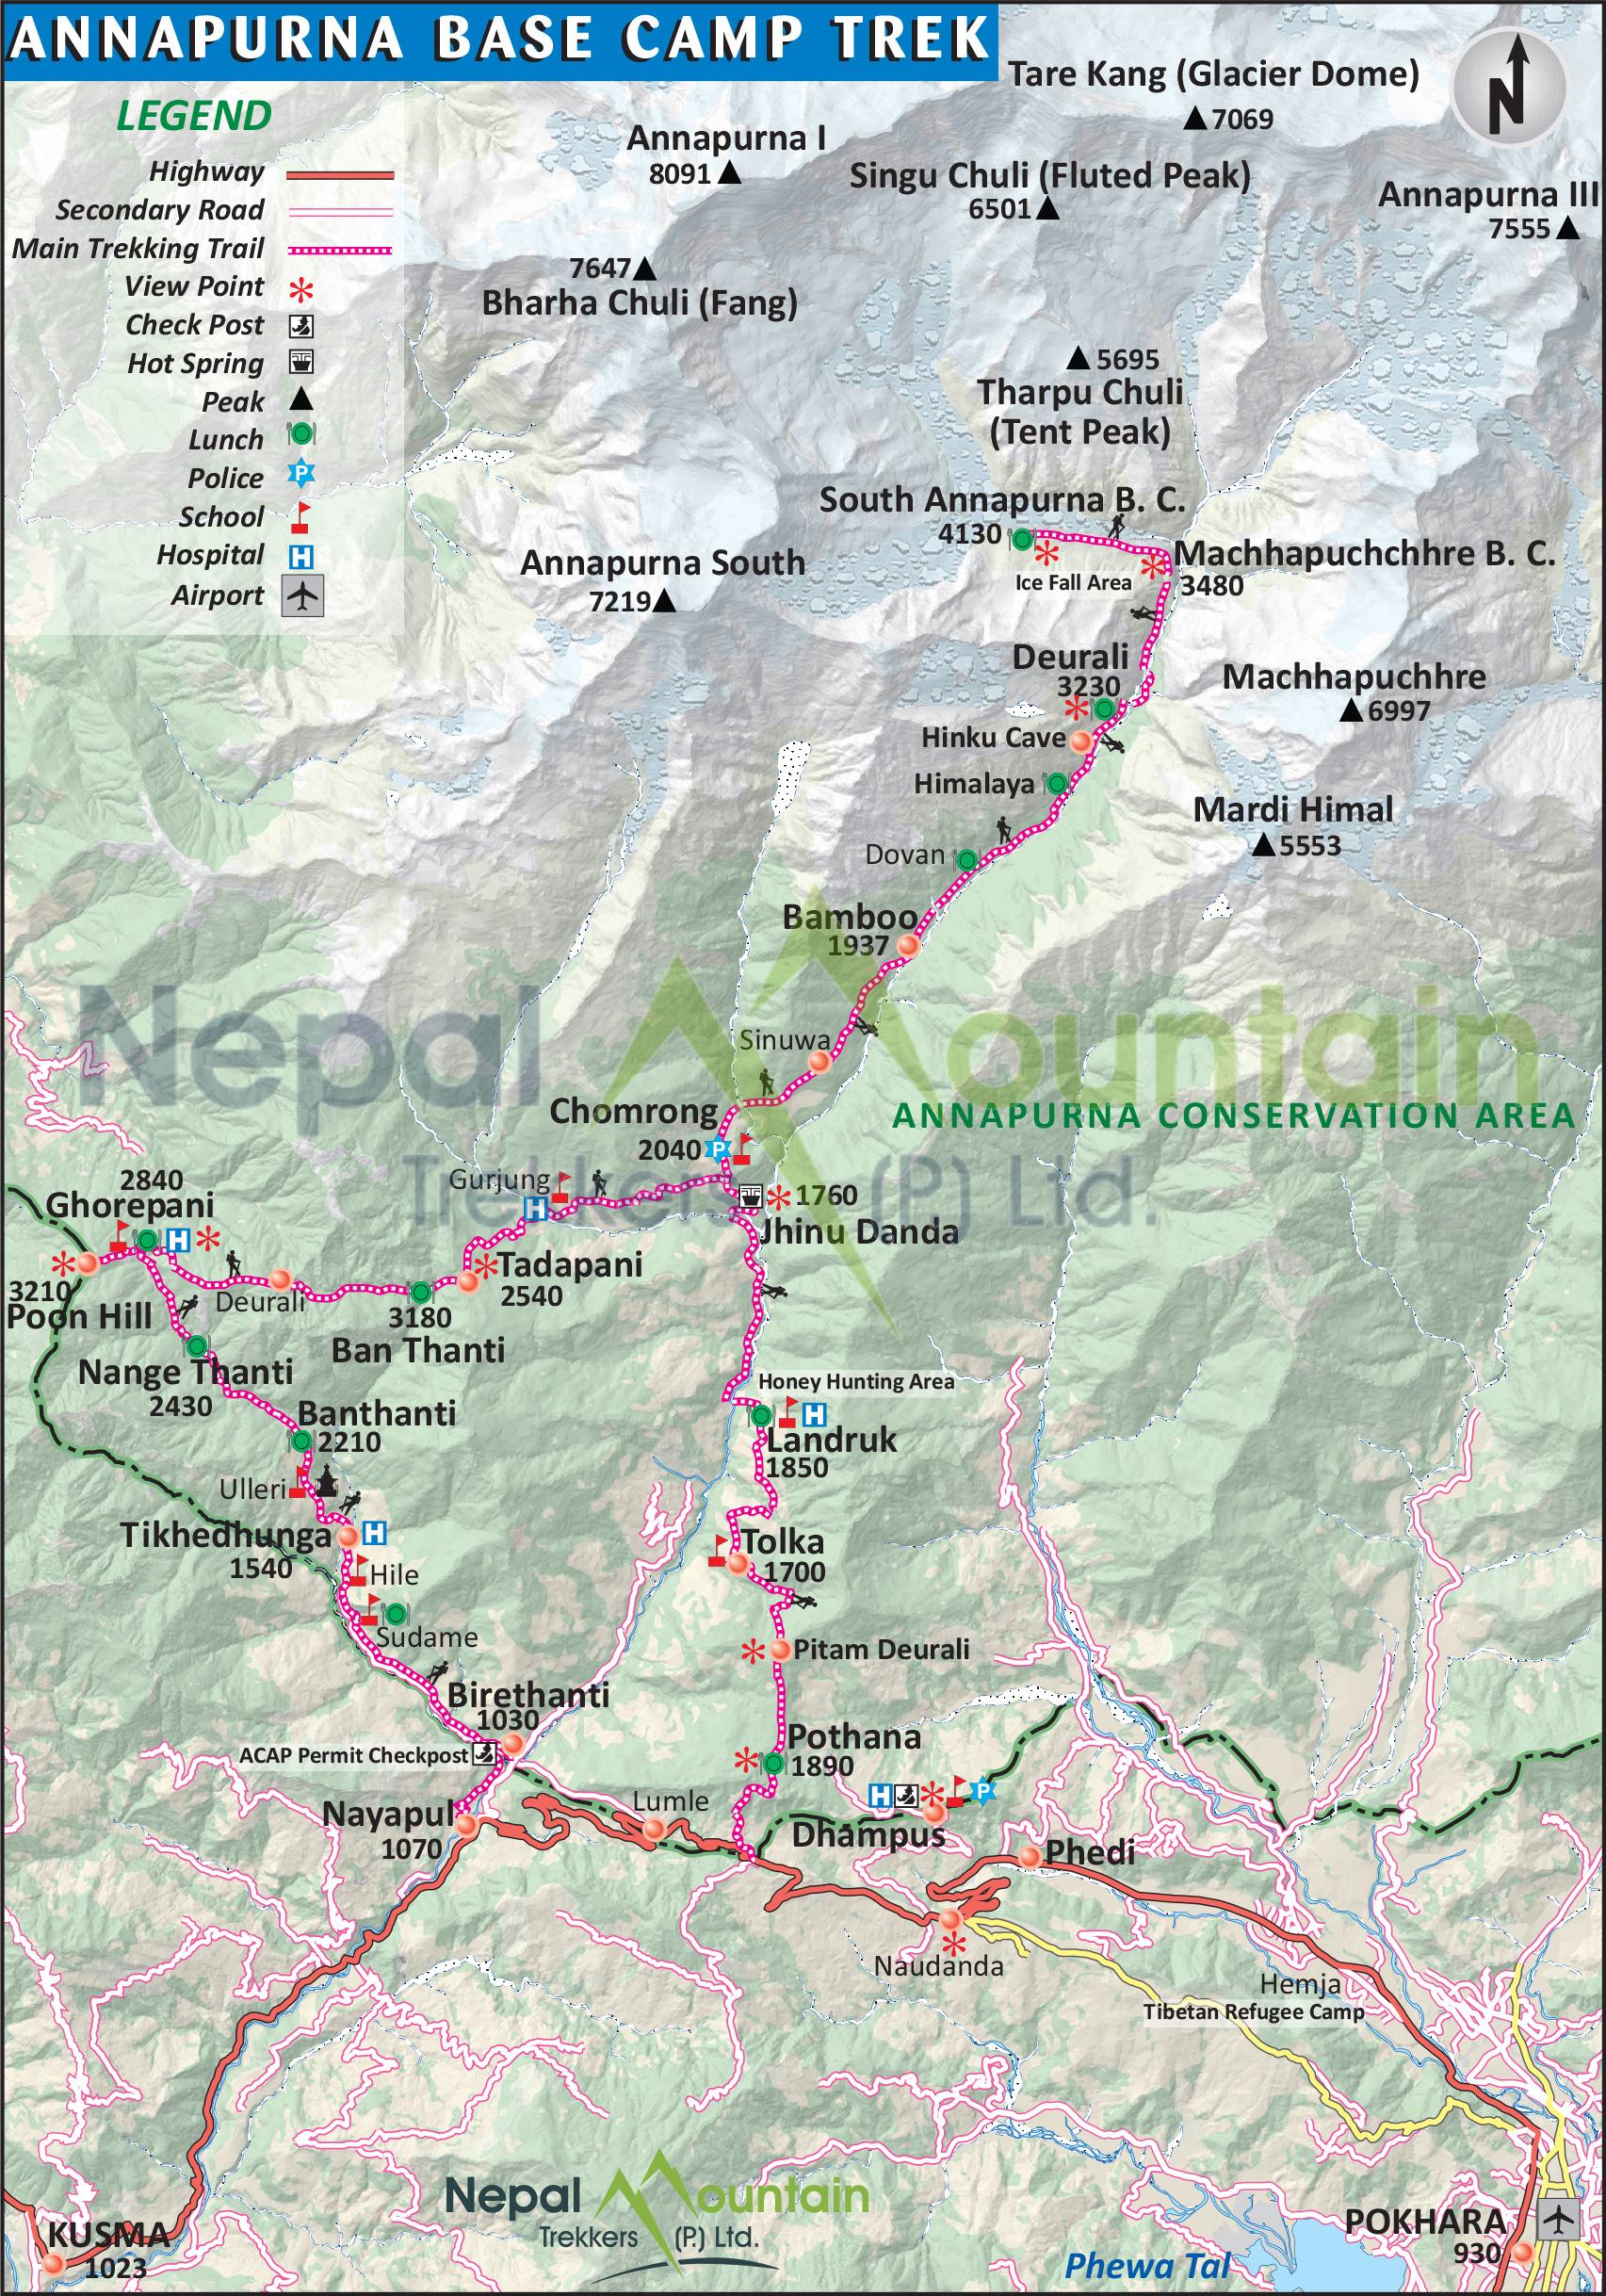 map of Annapurna Base Camp Trek - Long